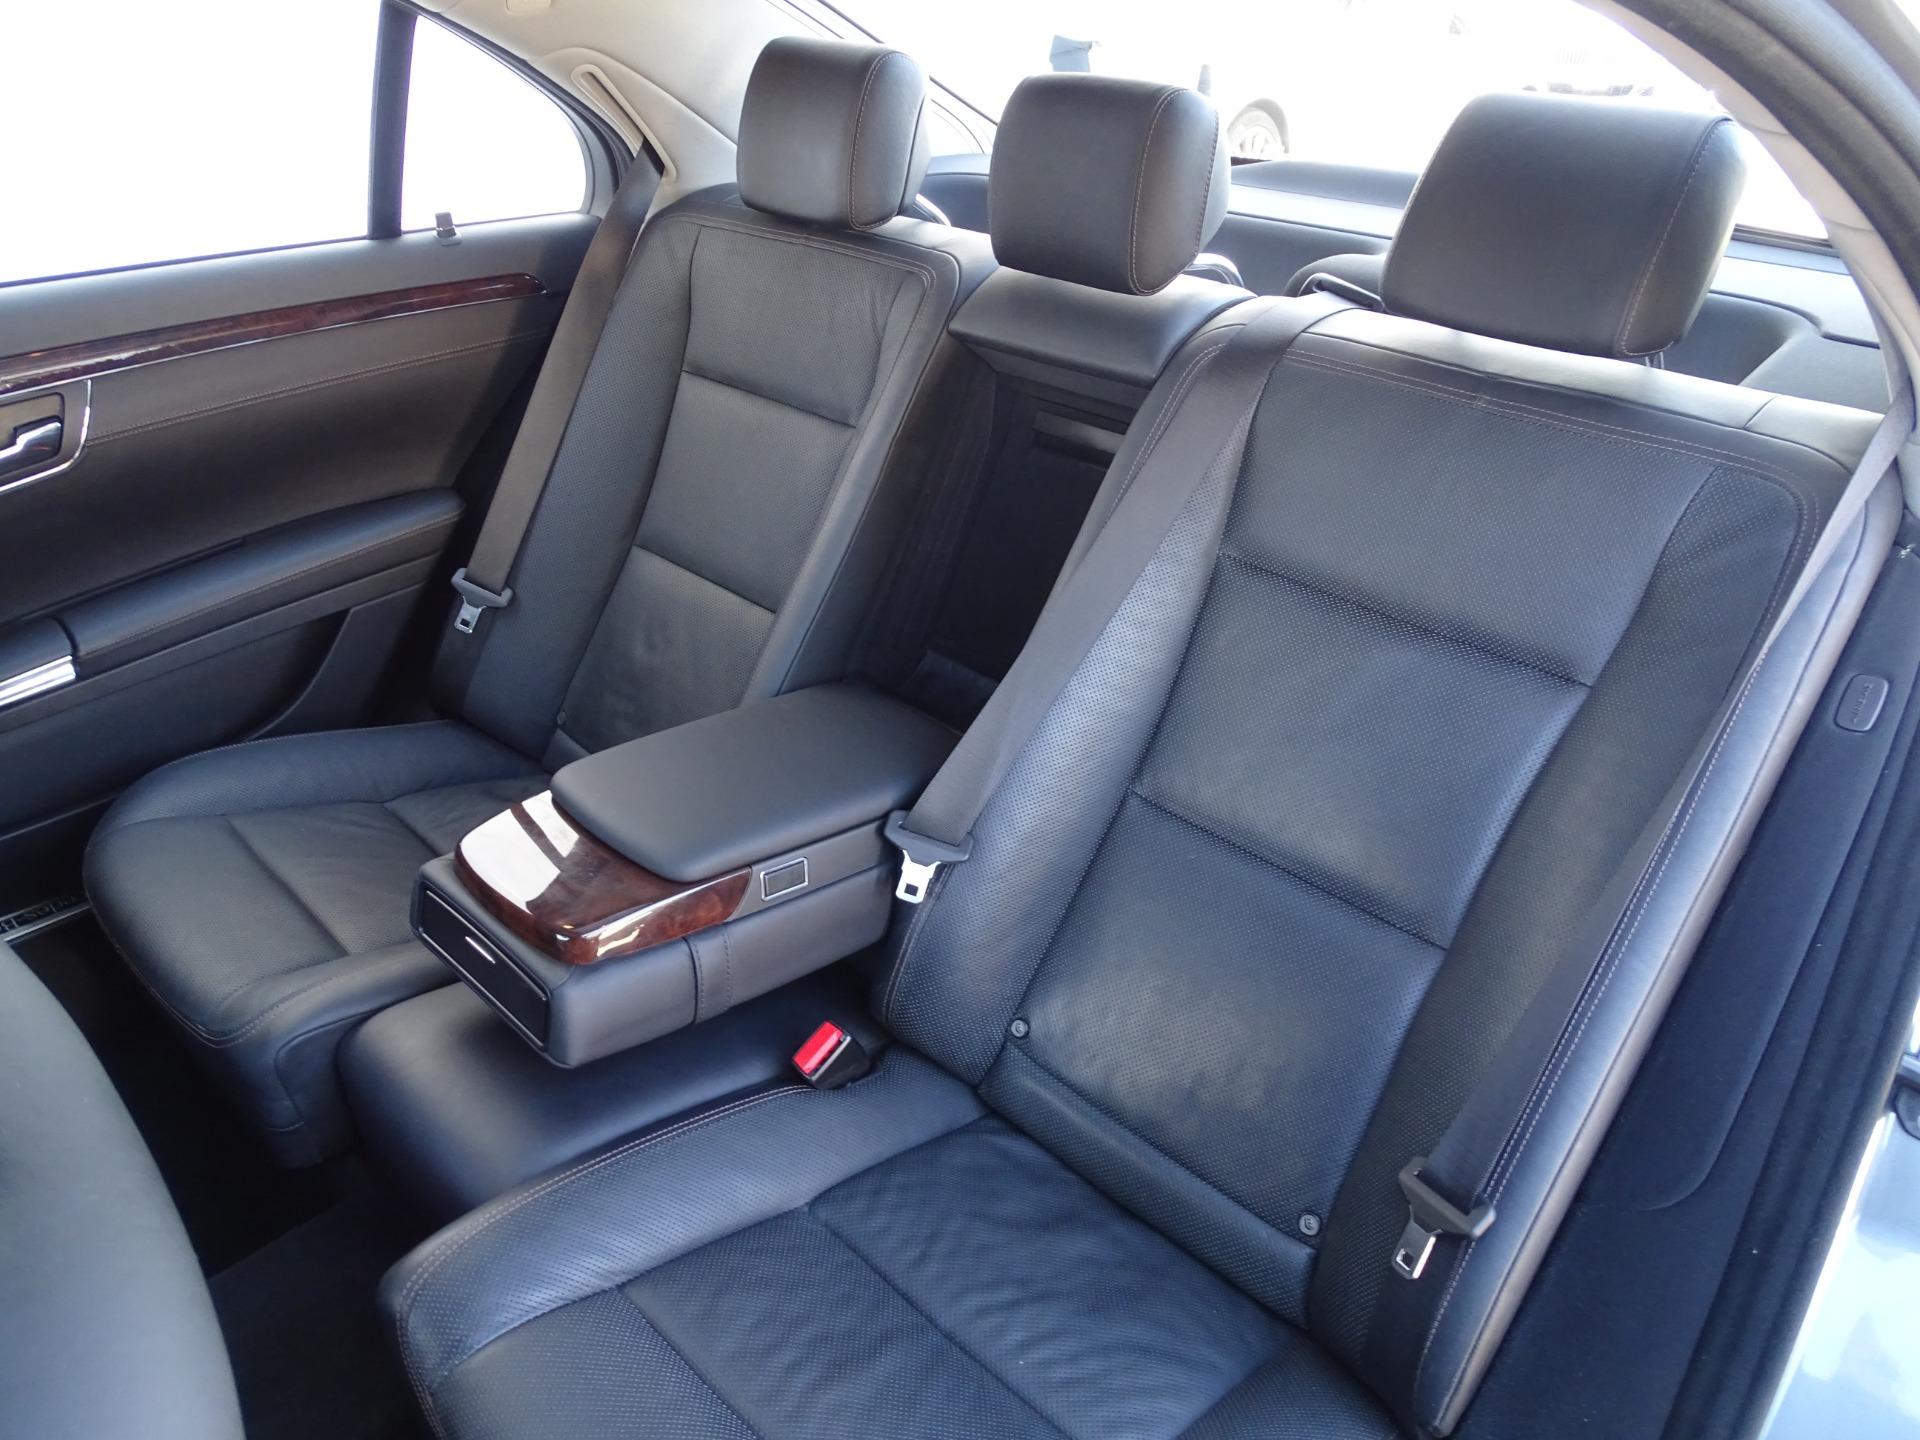 2013 Mercedes Benz S Class S550 Panoramic Moonroof Stock 6445 For Sale Near Redondo Beach Ca Ca Mercedes Benz Dealer